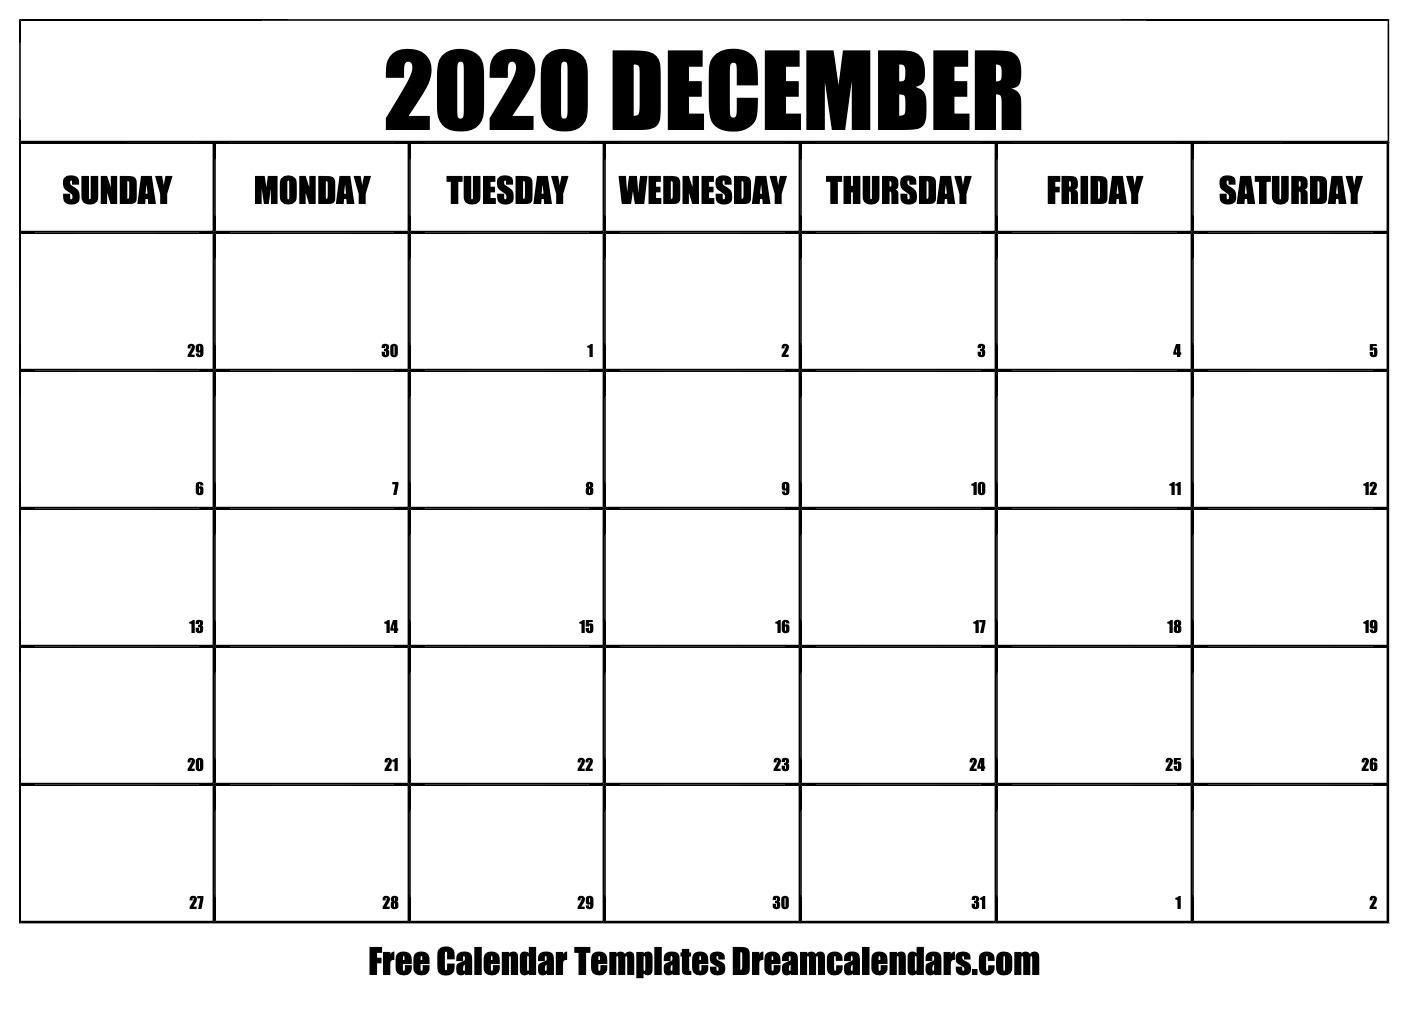 Free December 2020 Printable Calendar | Dream Calendars